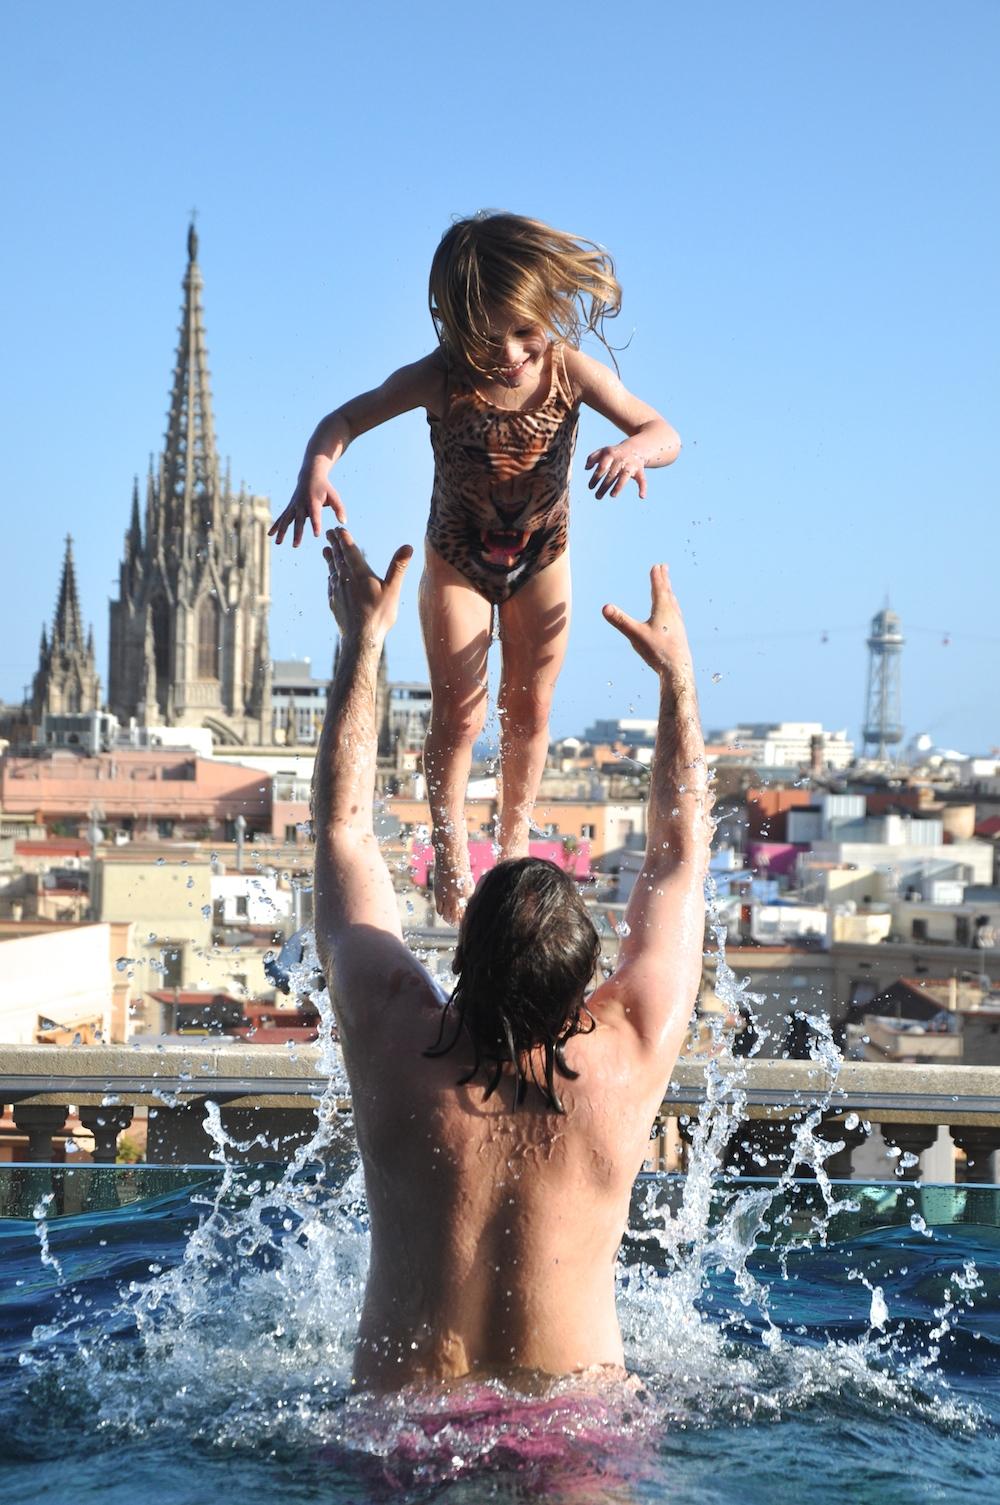 Popupshop_tiger_pool_hotel_ohla_barcelona